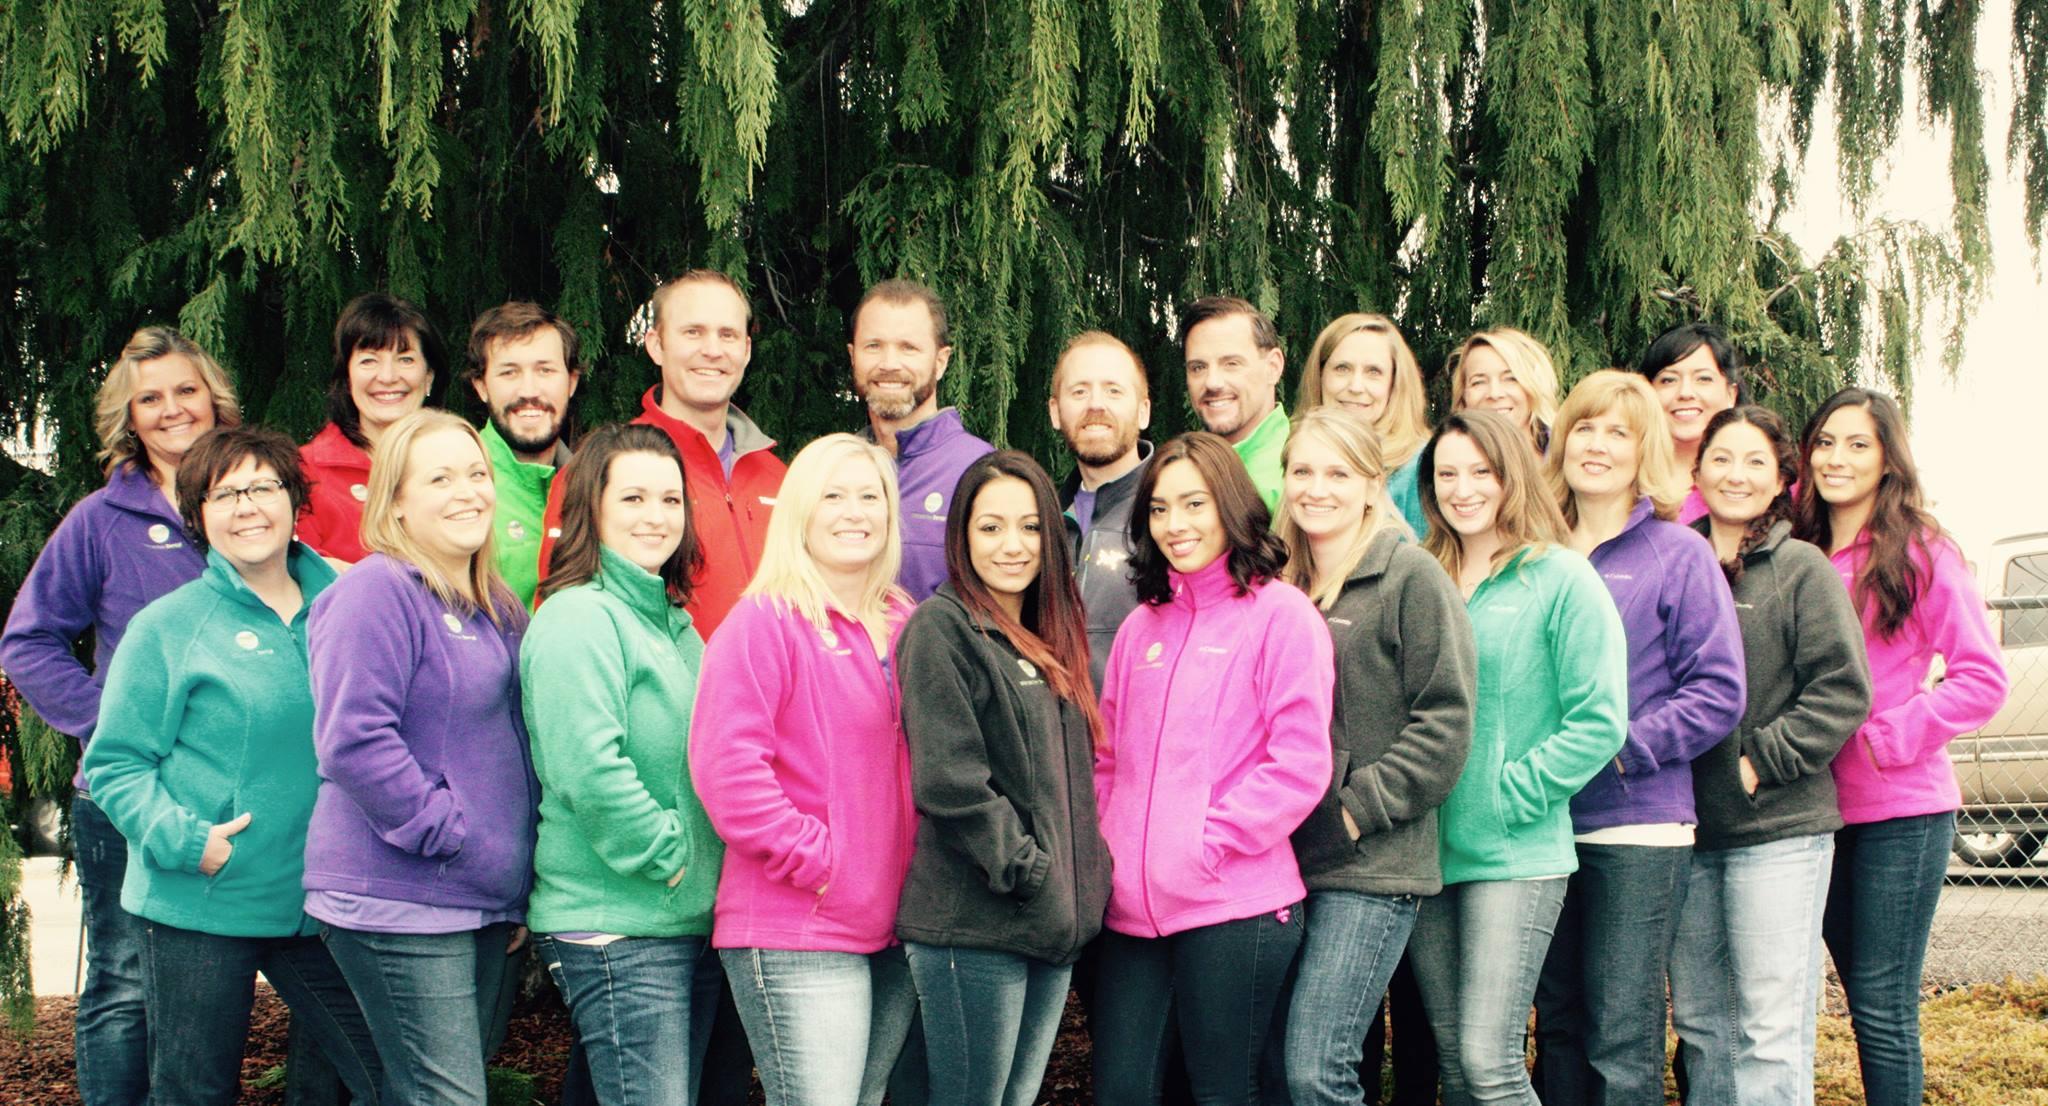 Wenatchee Dental Team - Dr. Aaron Kelly & Dr. Ruston Edwards